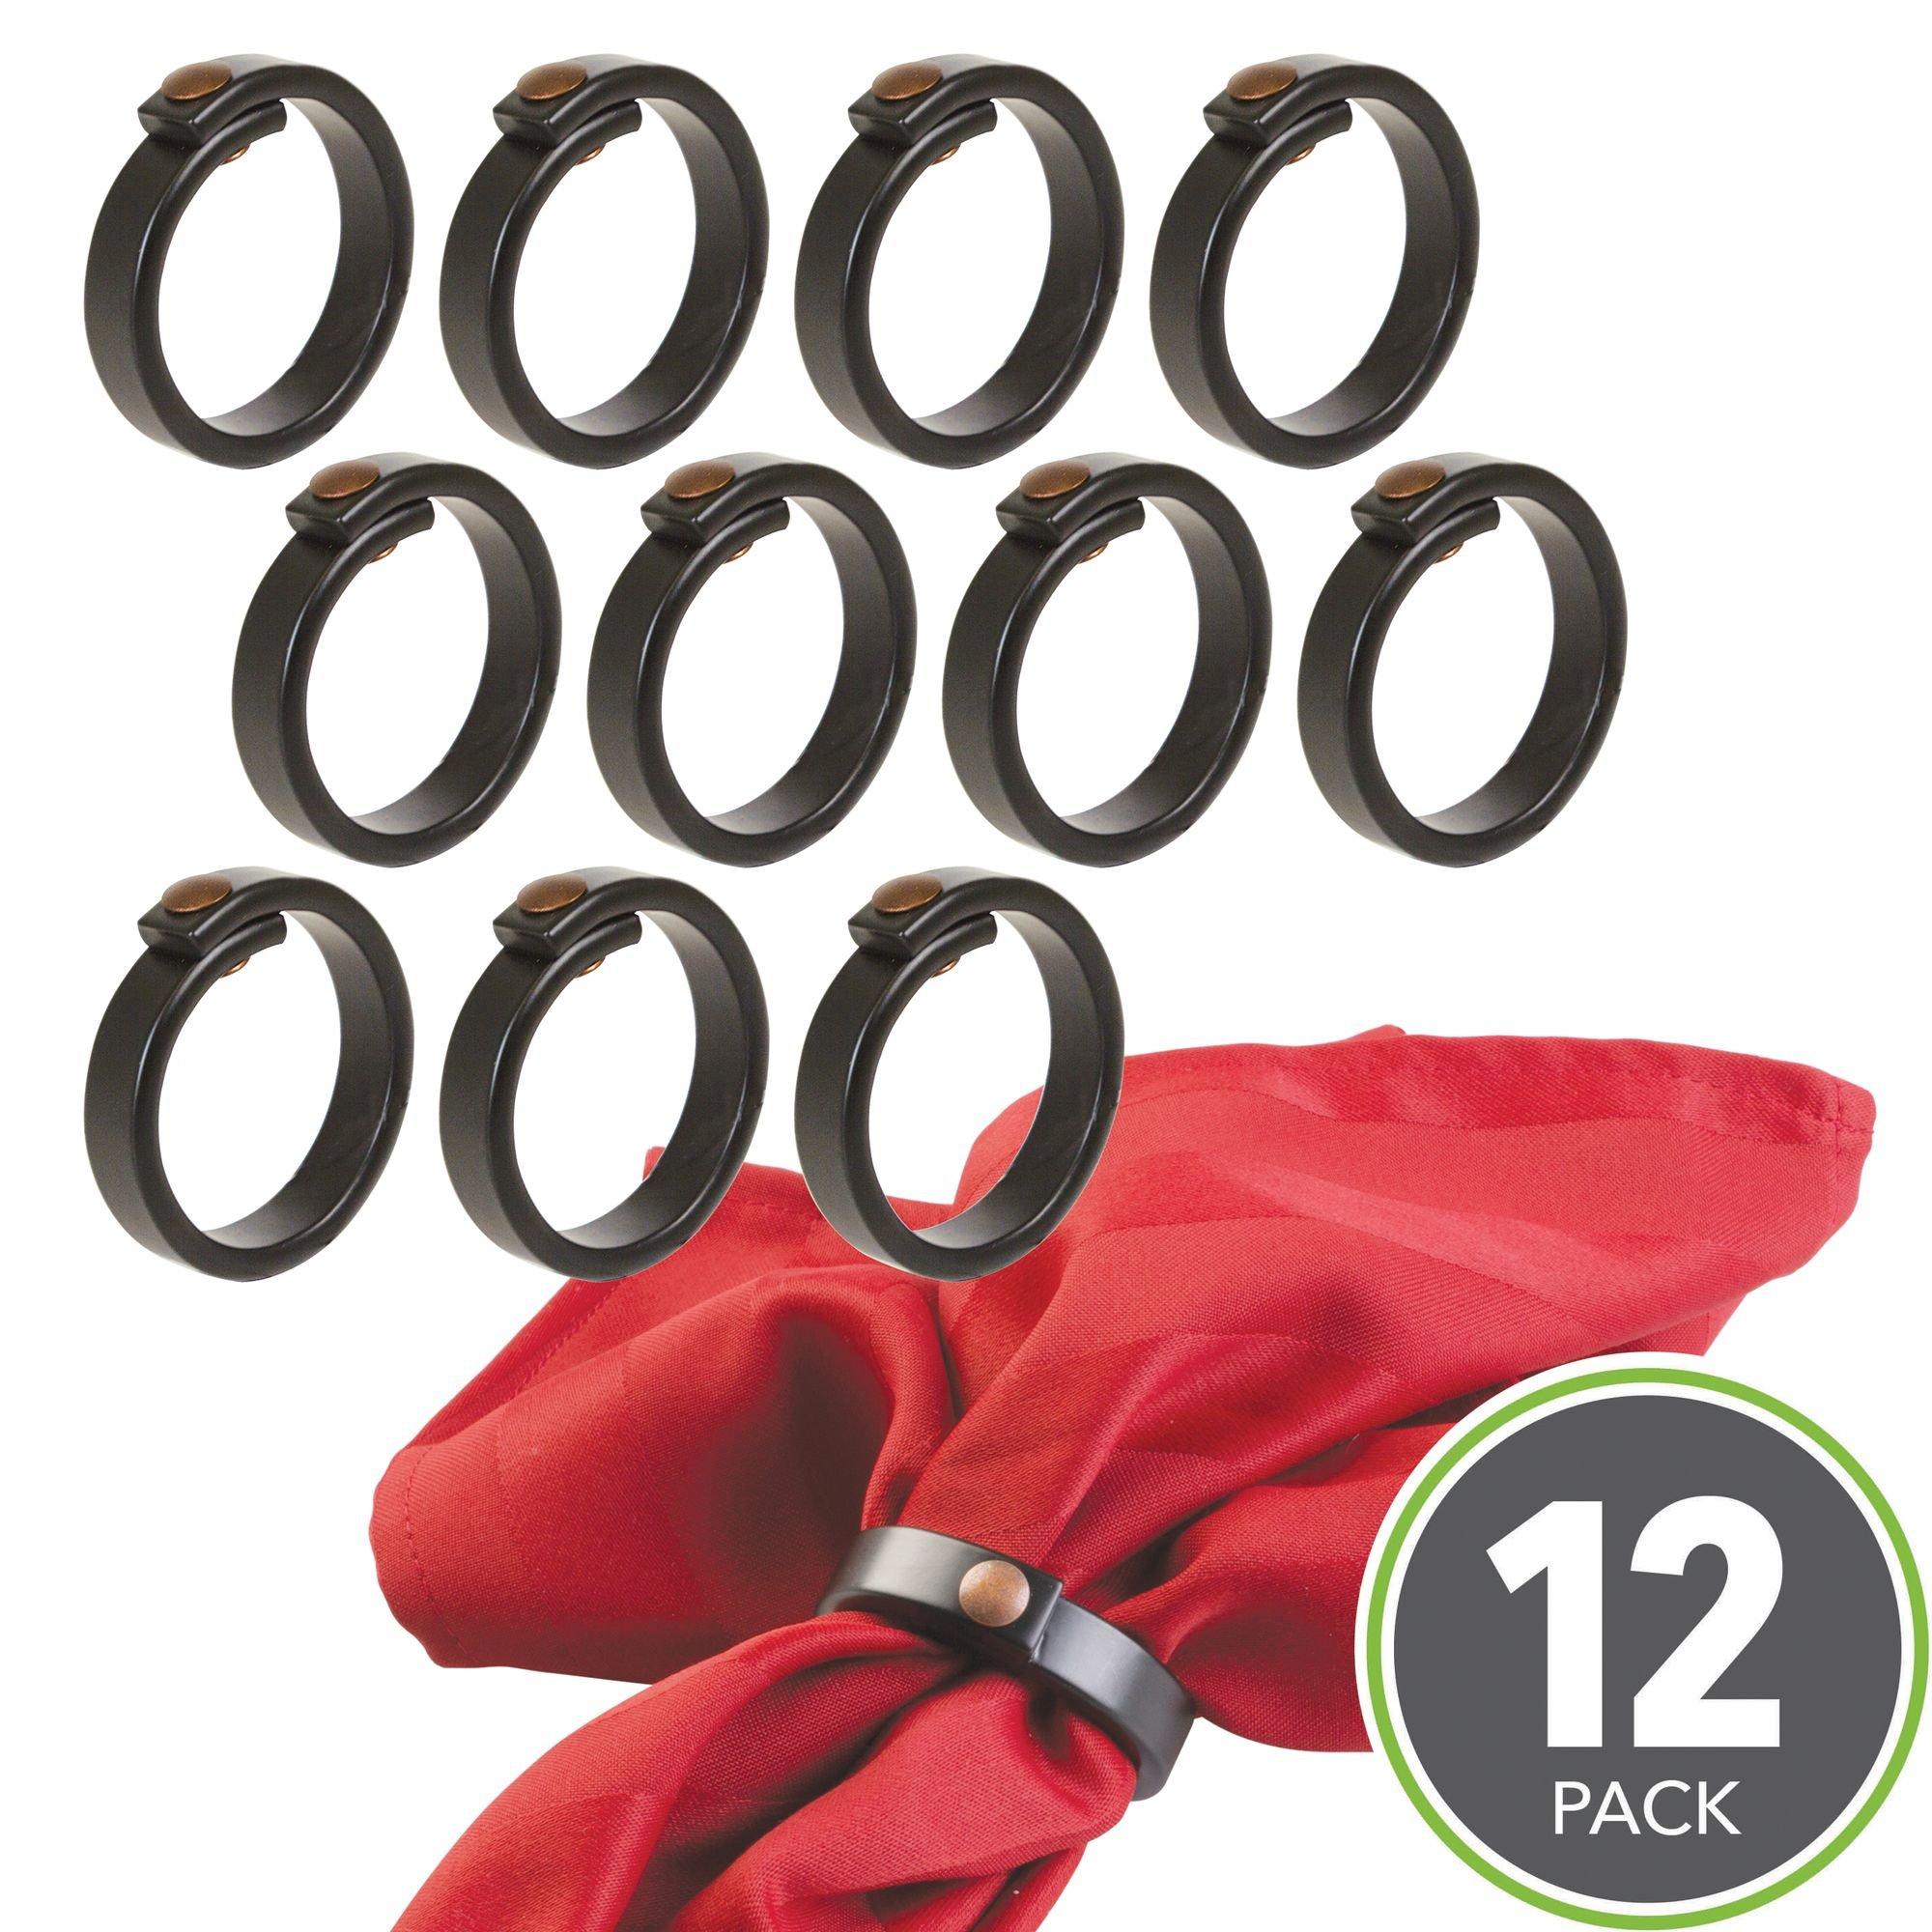 mDesign Metal Napkin Rings for Kitchen, Dining Room, Weddings, Dinner Party - Pack of 12, Matte Black